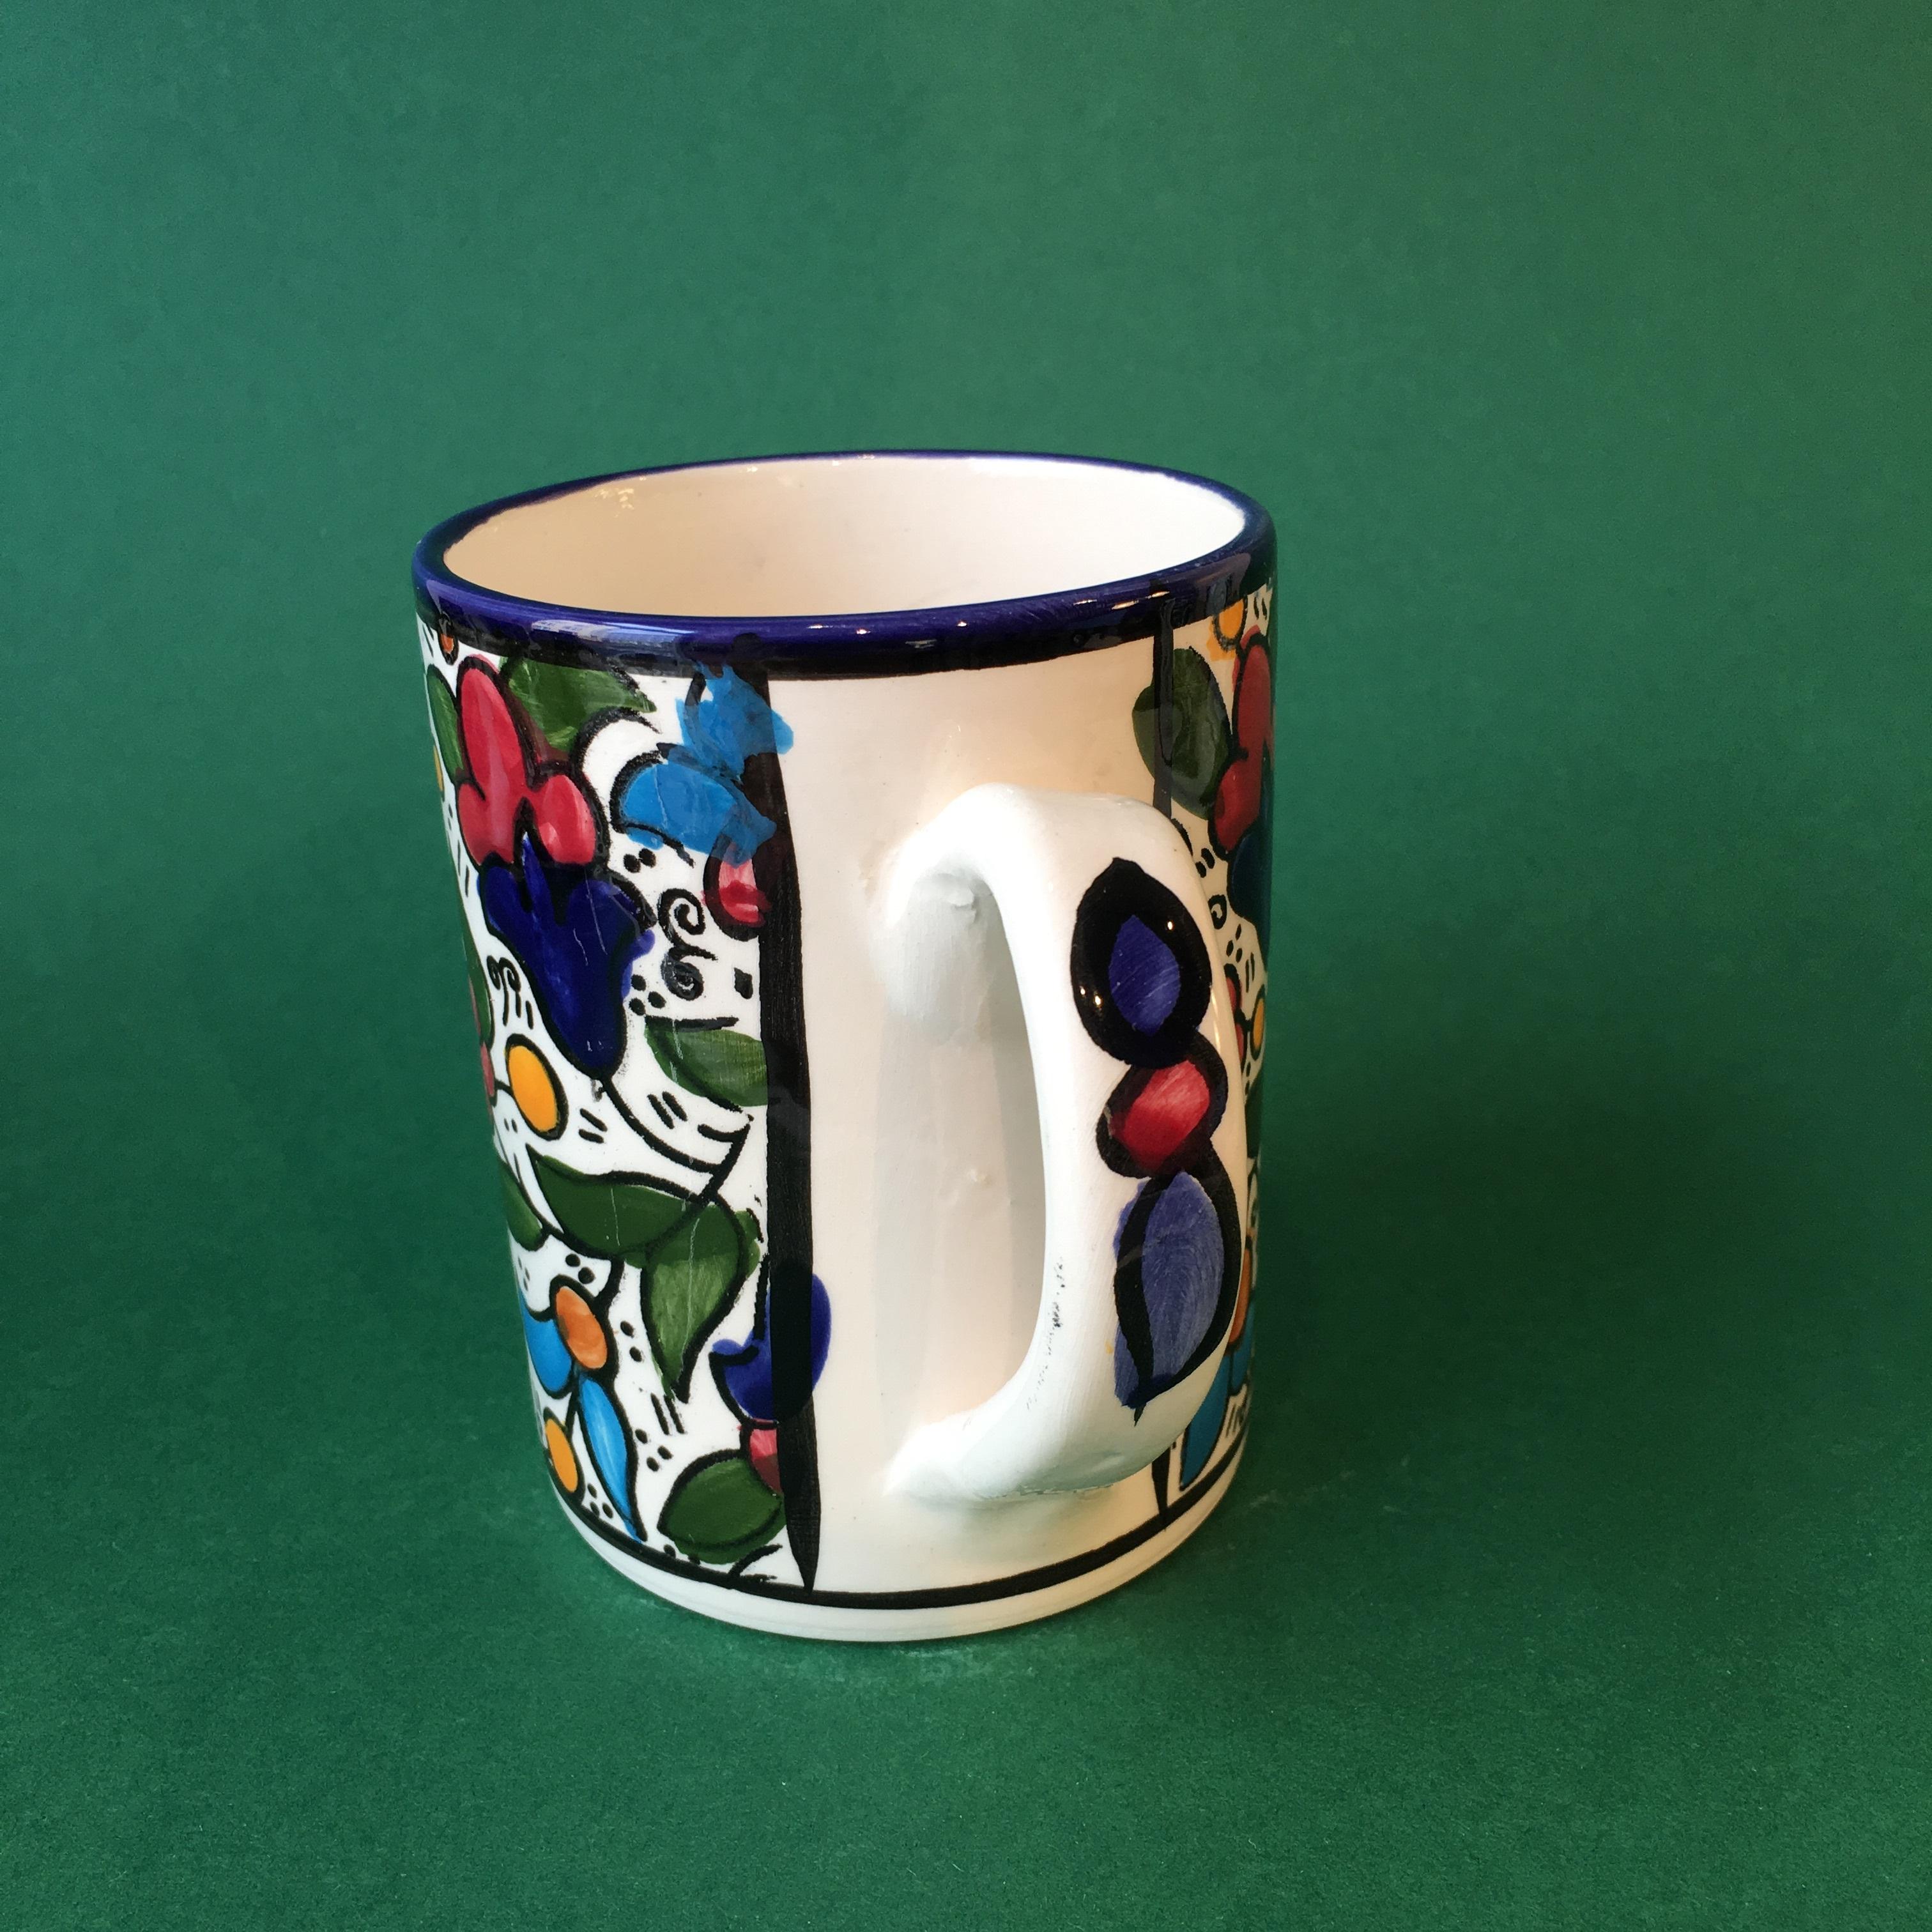 Stor keramikkopp, flerfarget